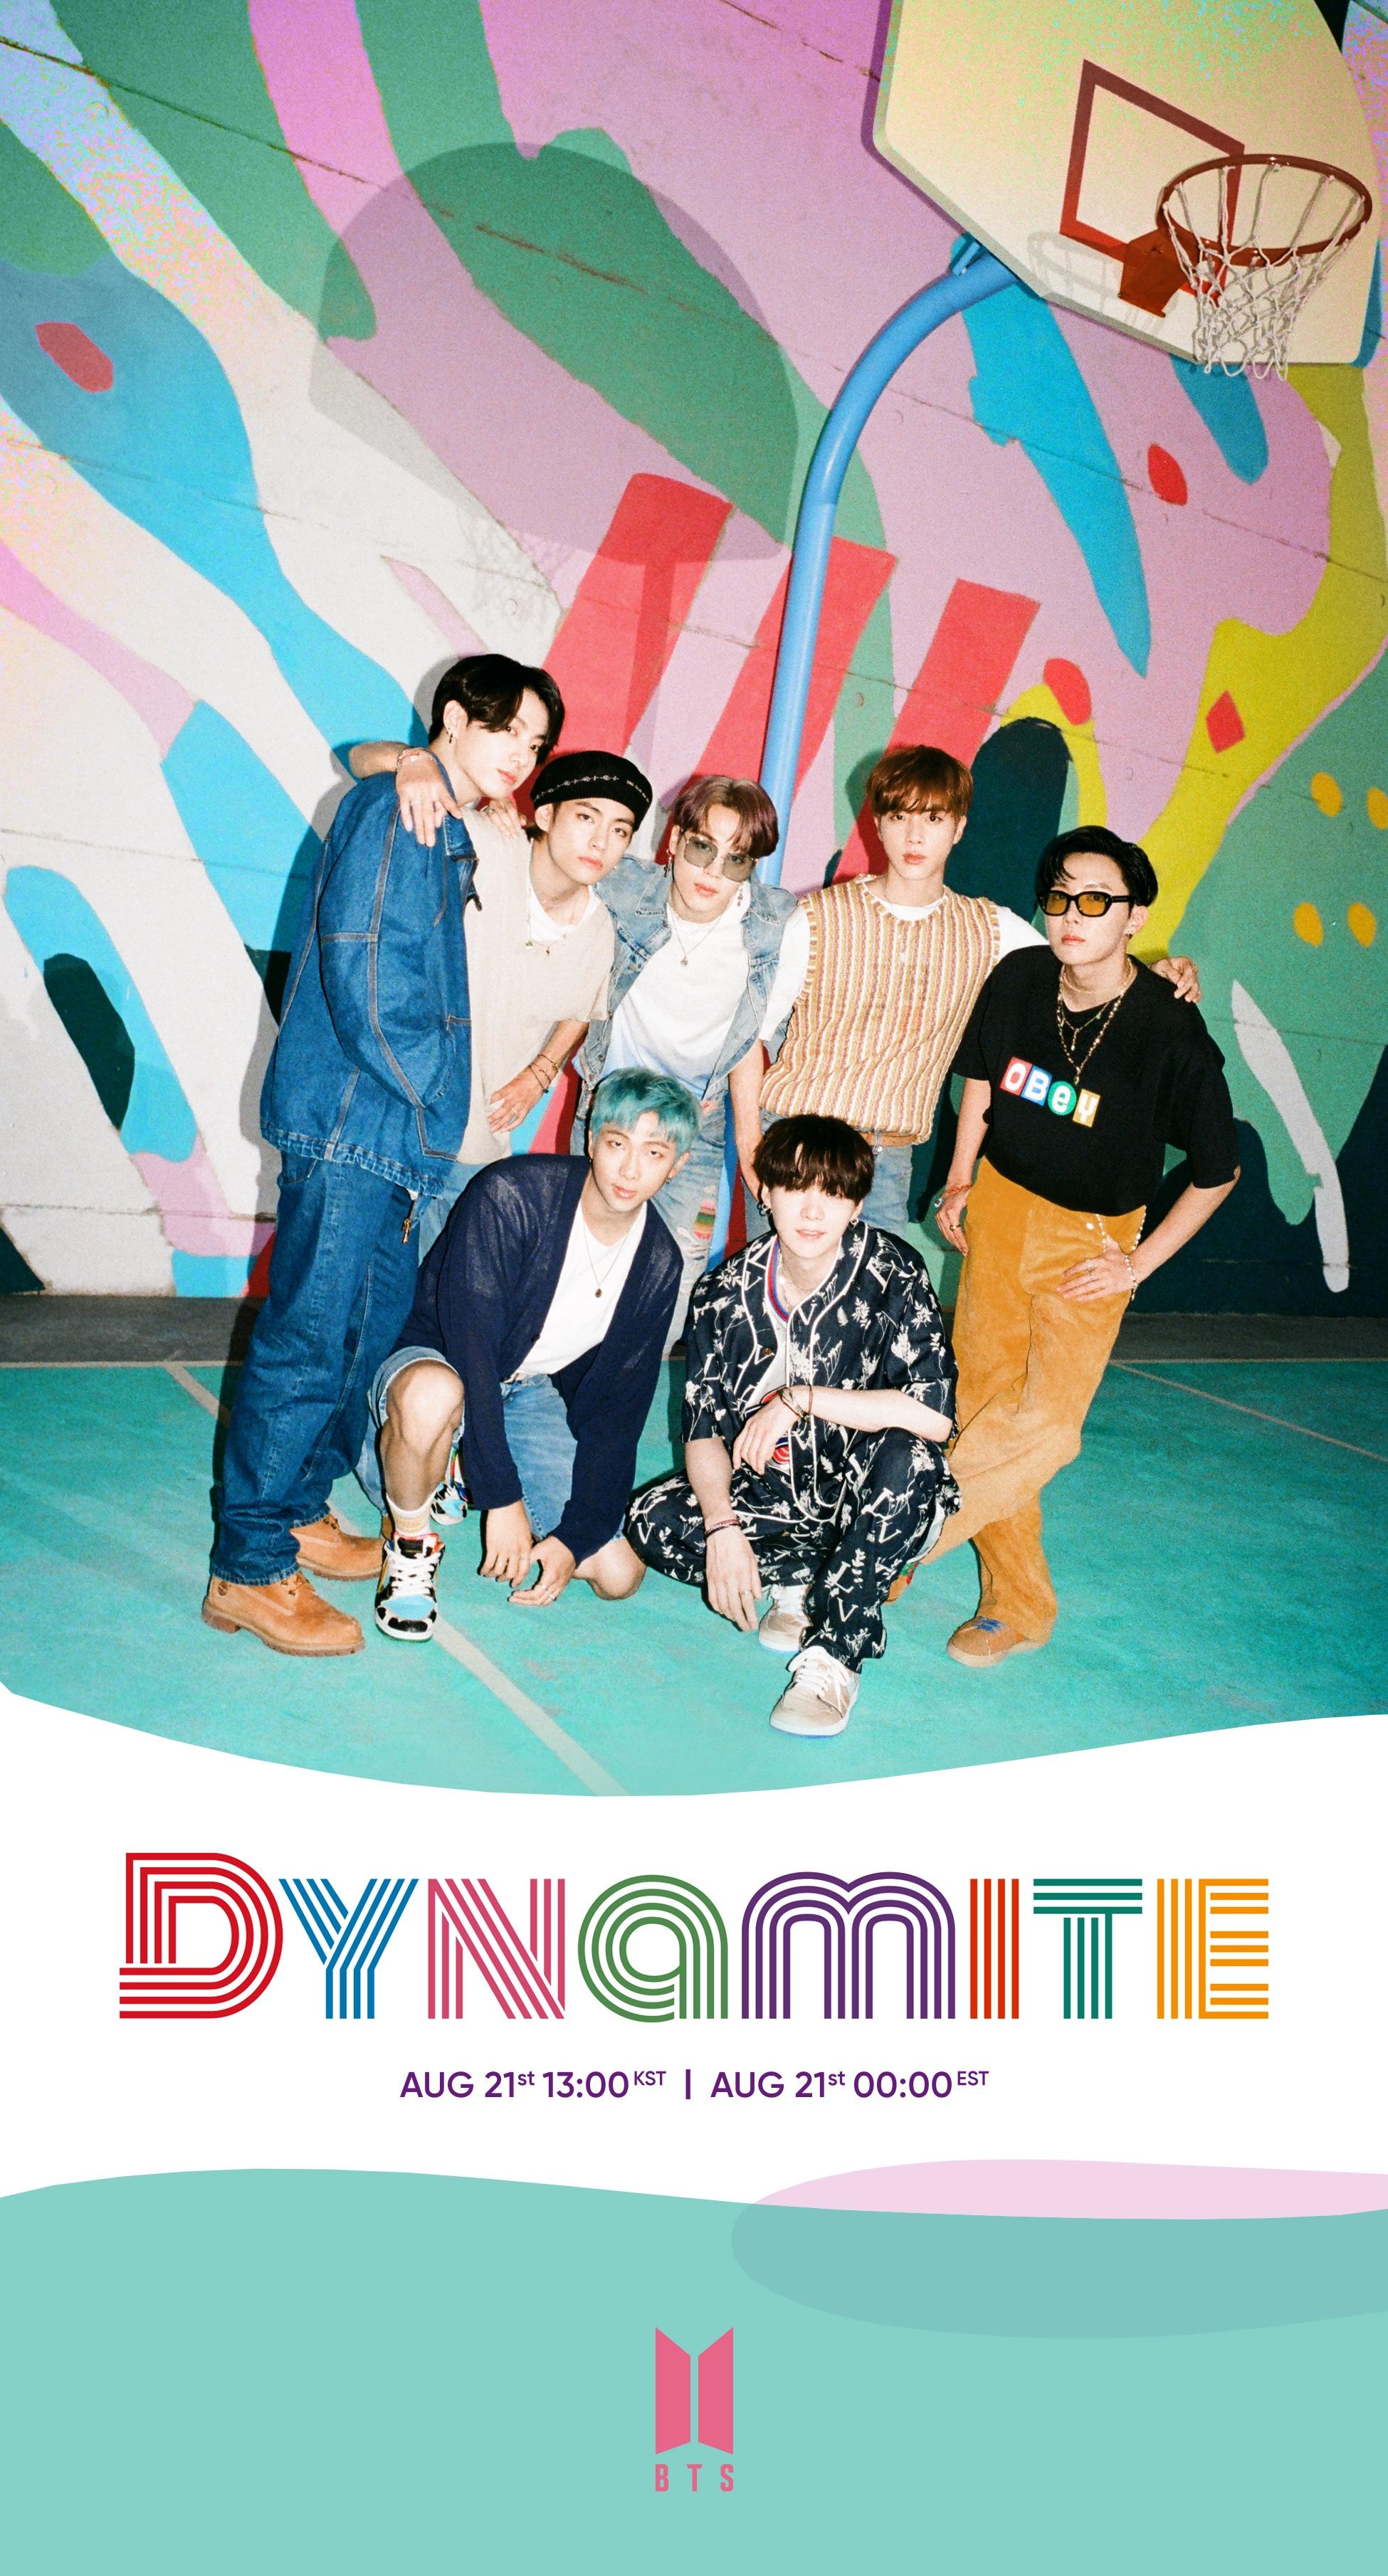 dynamite-bts_1